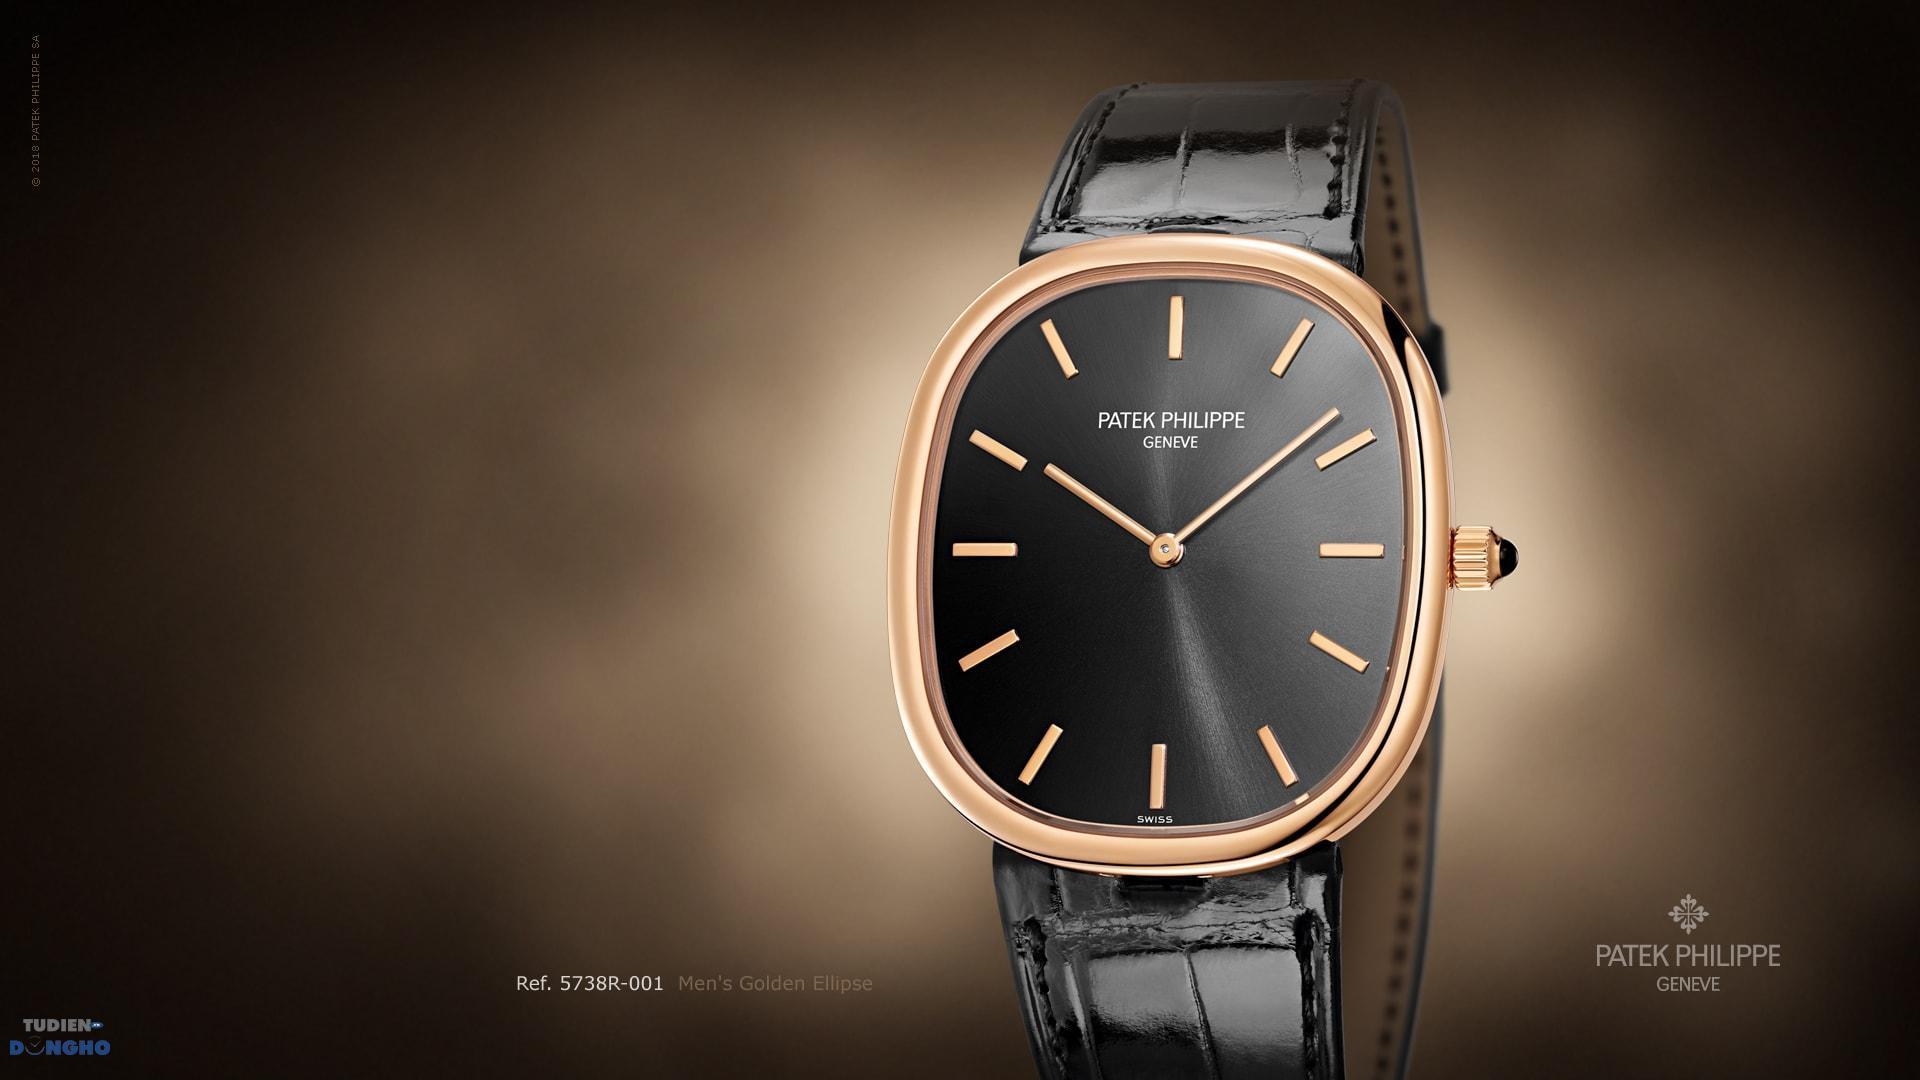 Đồng hồ Patek Philippe Golden Ellipse 5738R-001 phiên bản kỷ niệm 50 năm